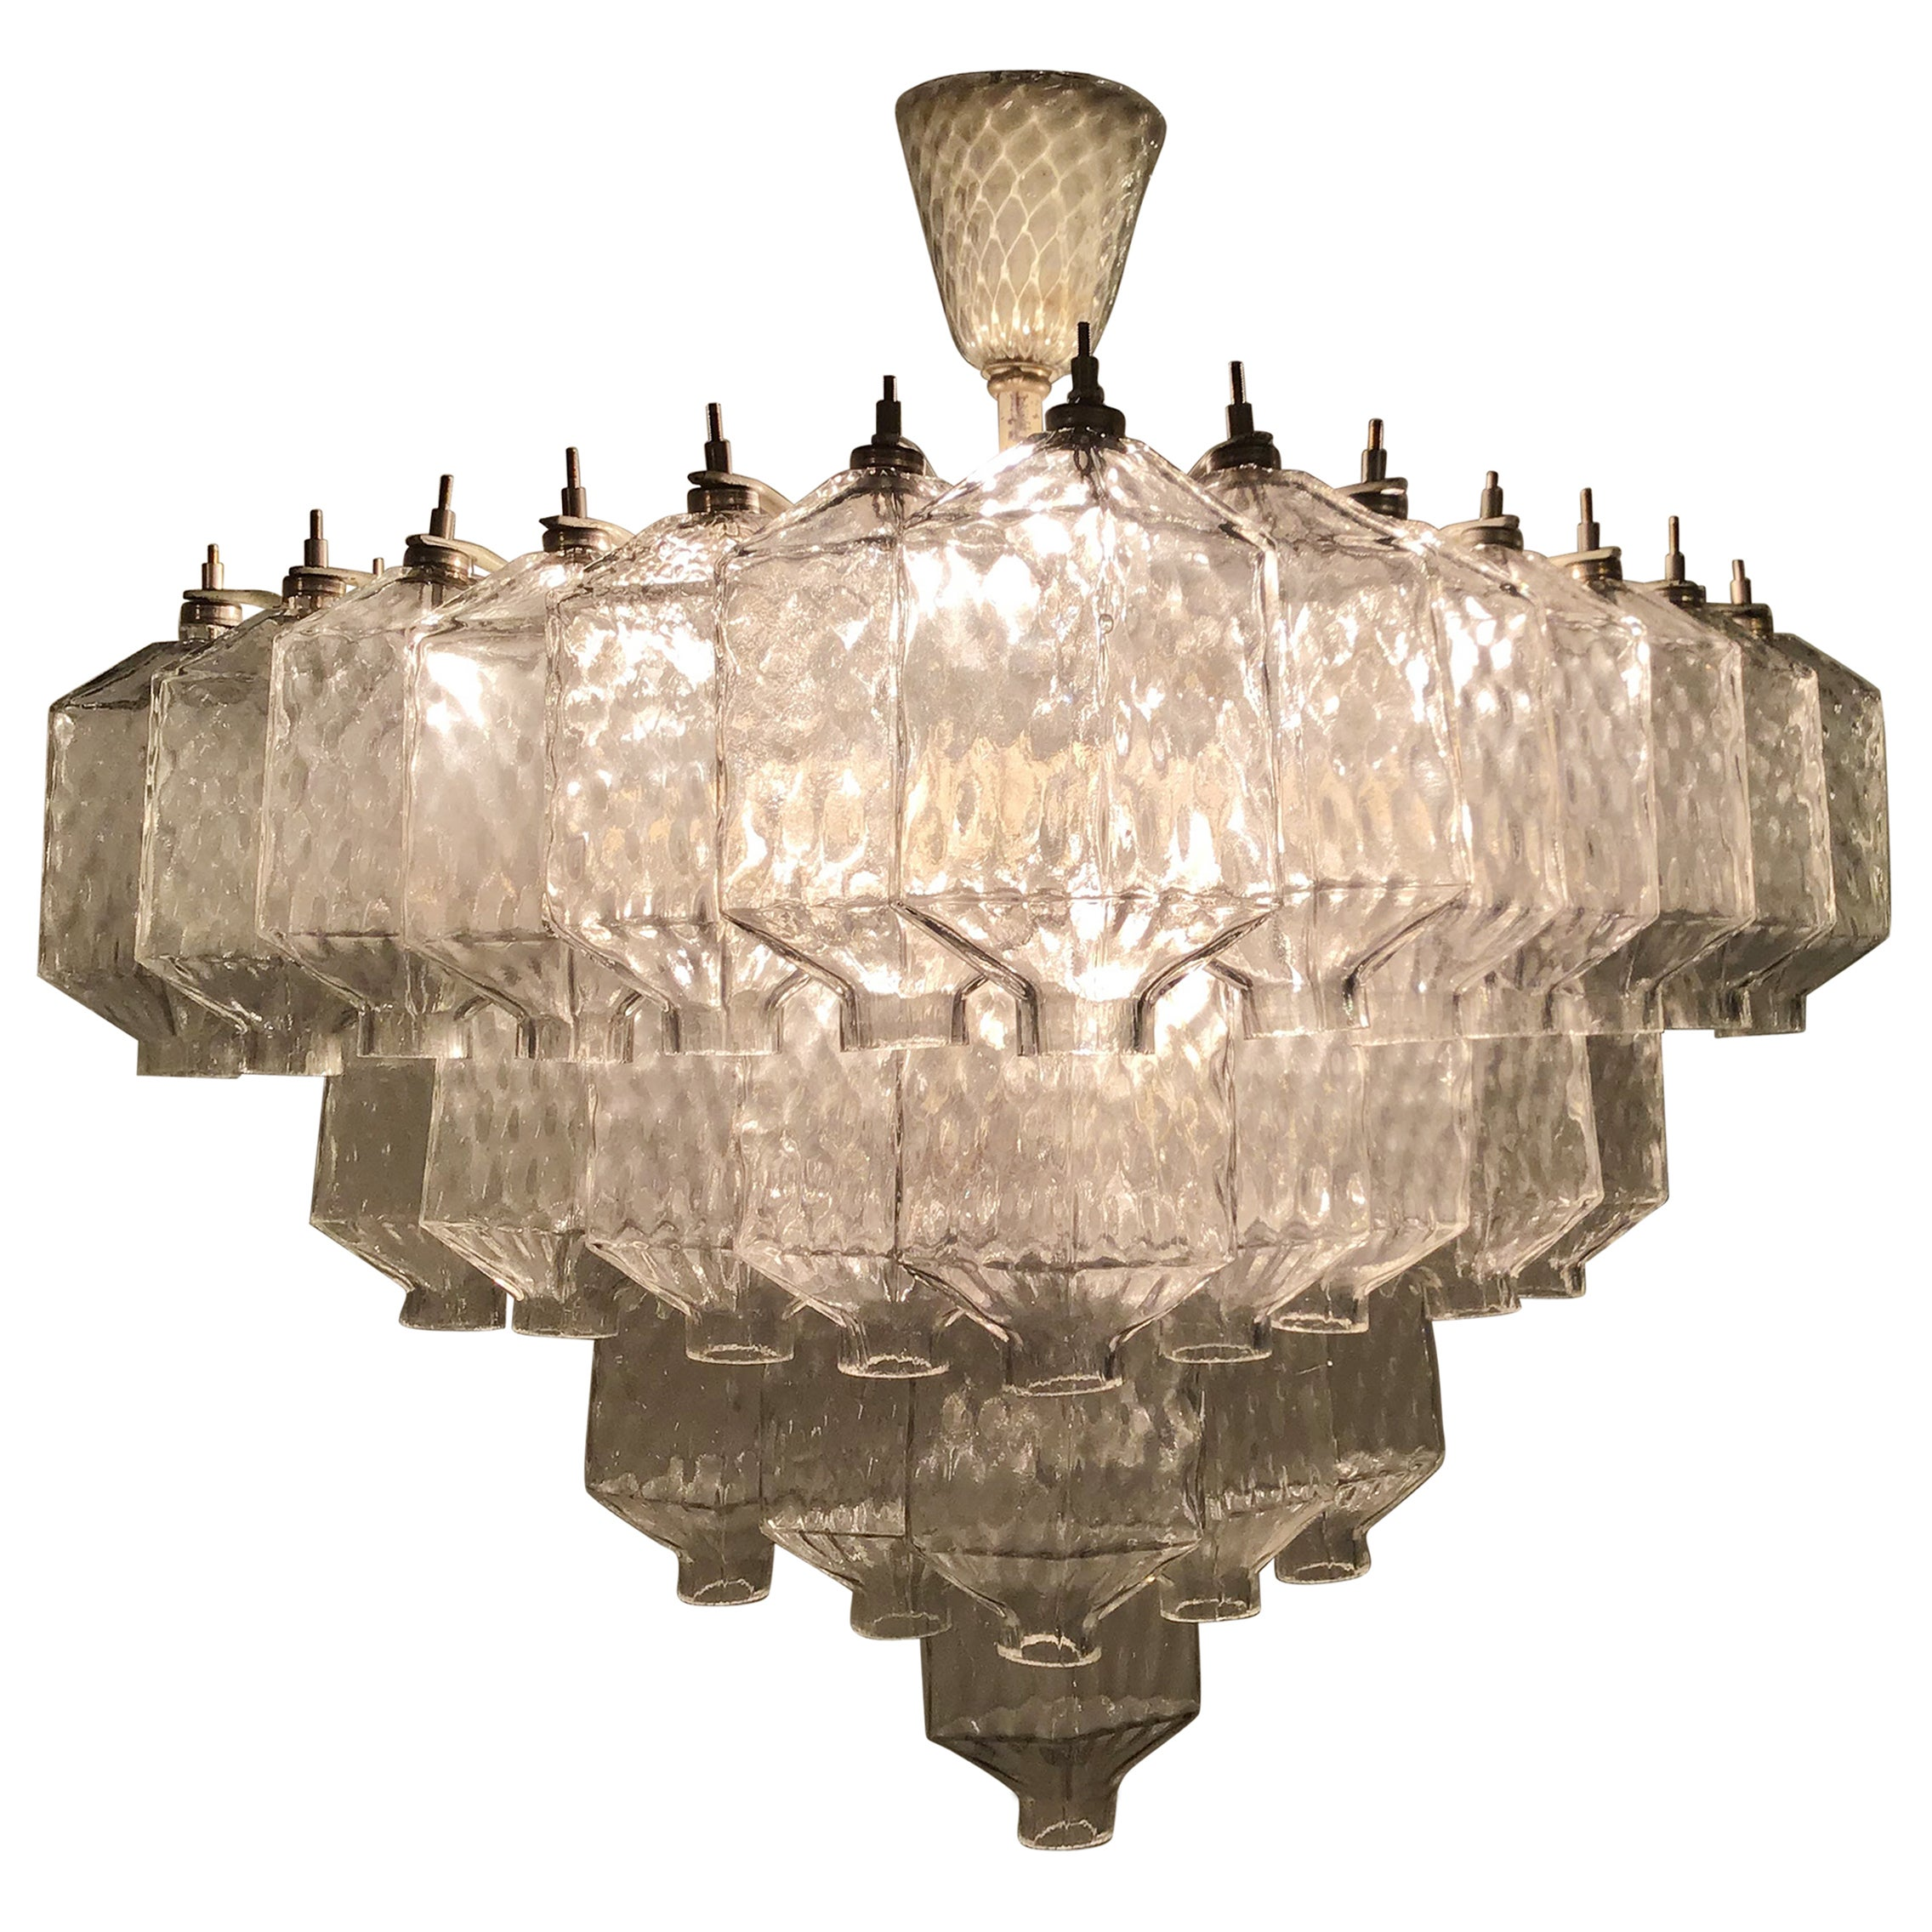 Venini Chandelier 1950 Murano Glass Iron, Italy